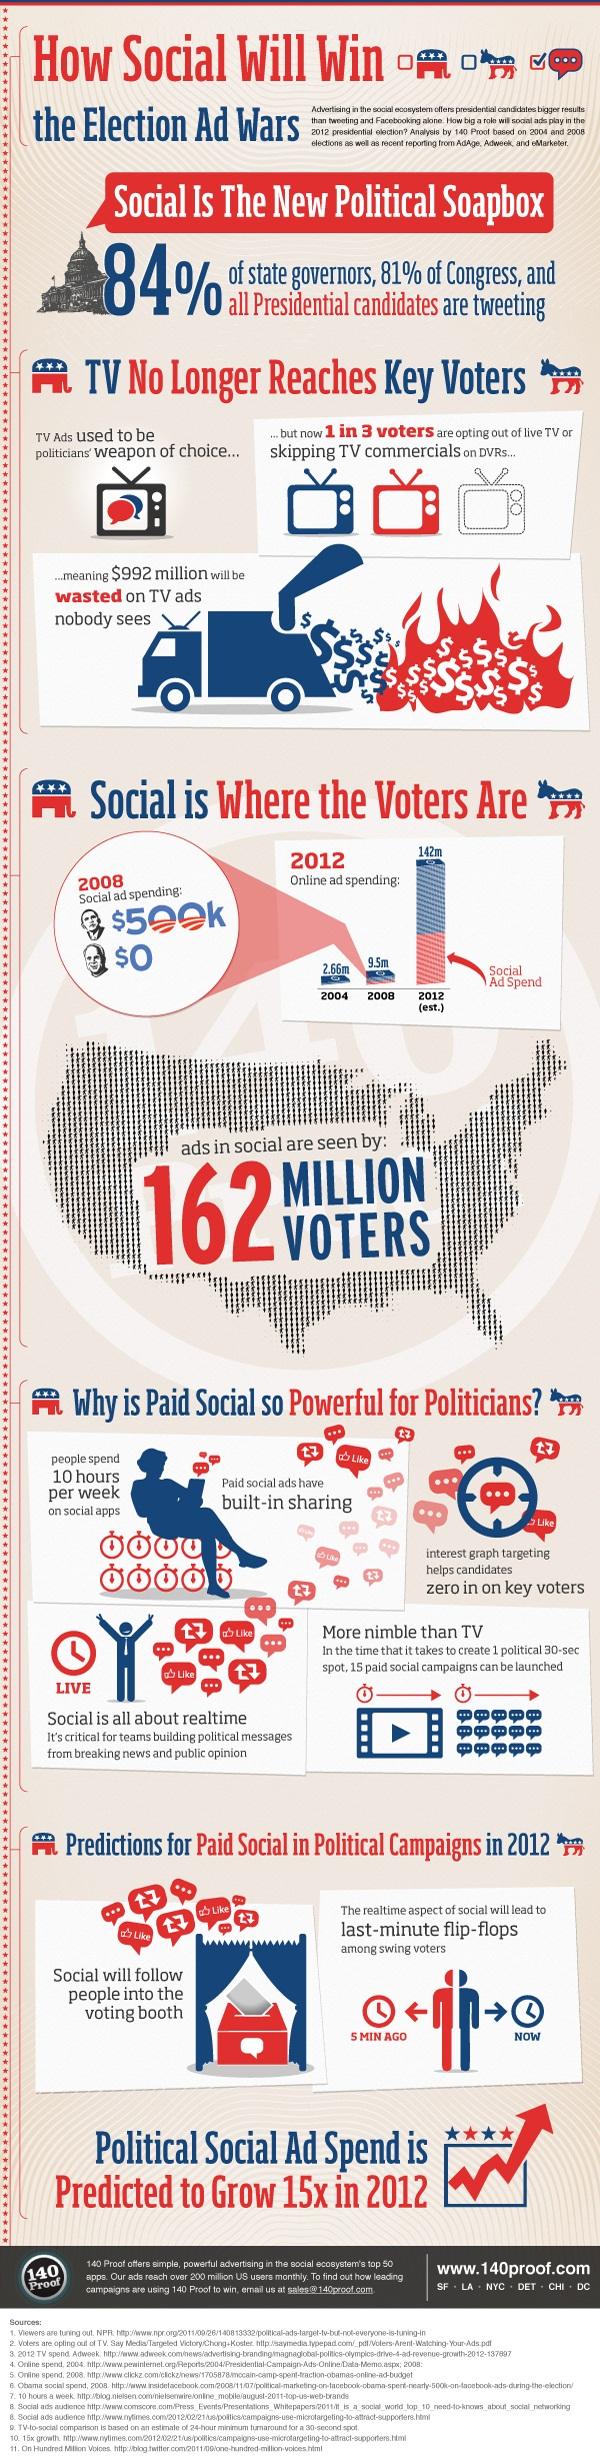 How social will win